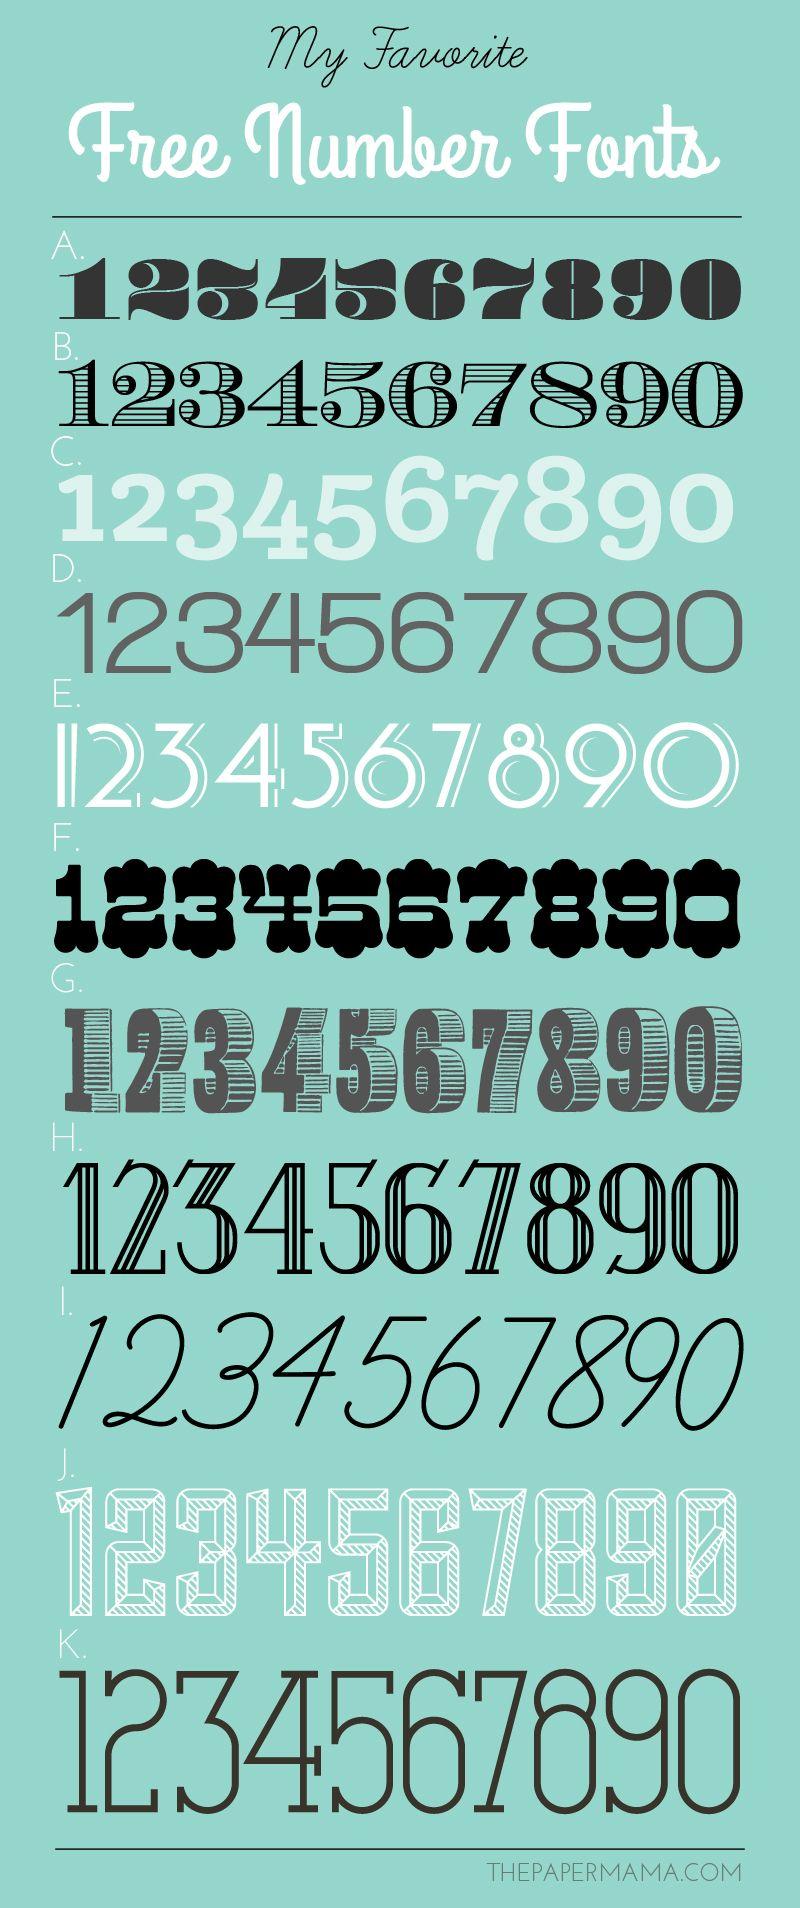 Download My Favorite Free Number Fonts! | Number fonts, Lettering ...